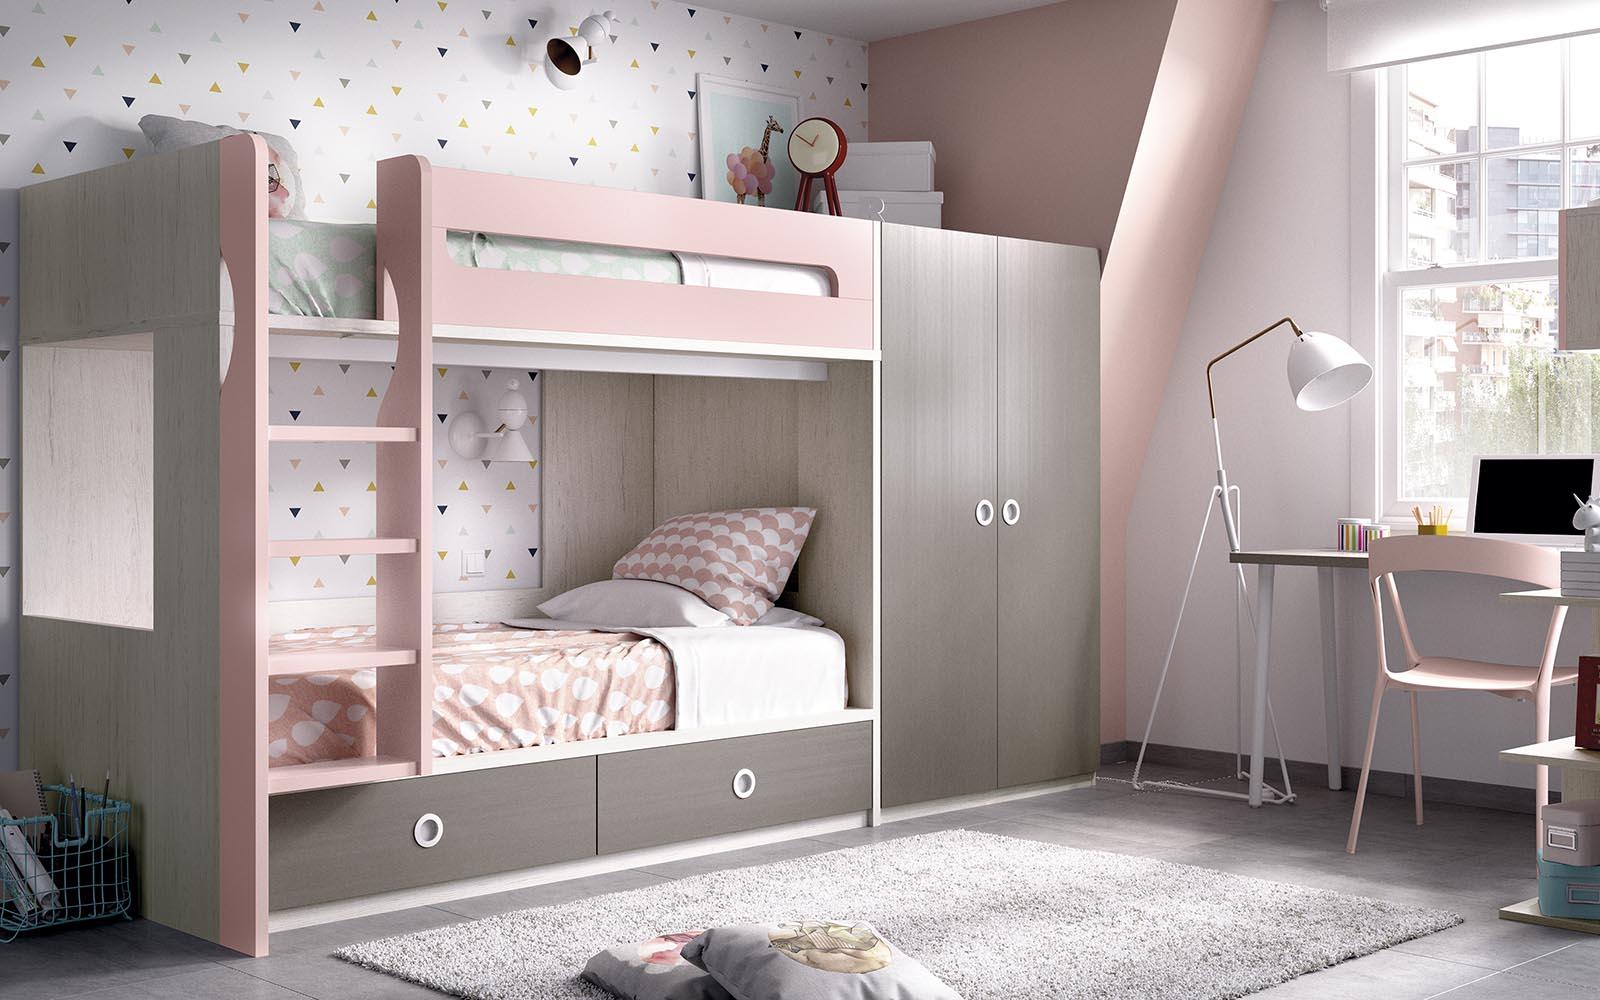 bunk bed, up and down bed, pano kato krevati paidiko, roz xilino krevatii paidiko koritsistiko, girly kids bed with latter,